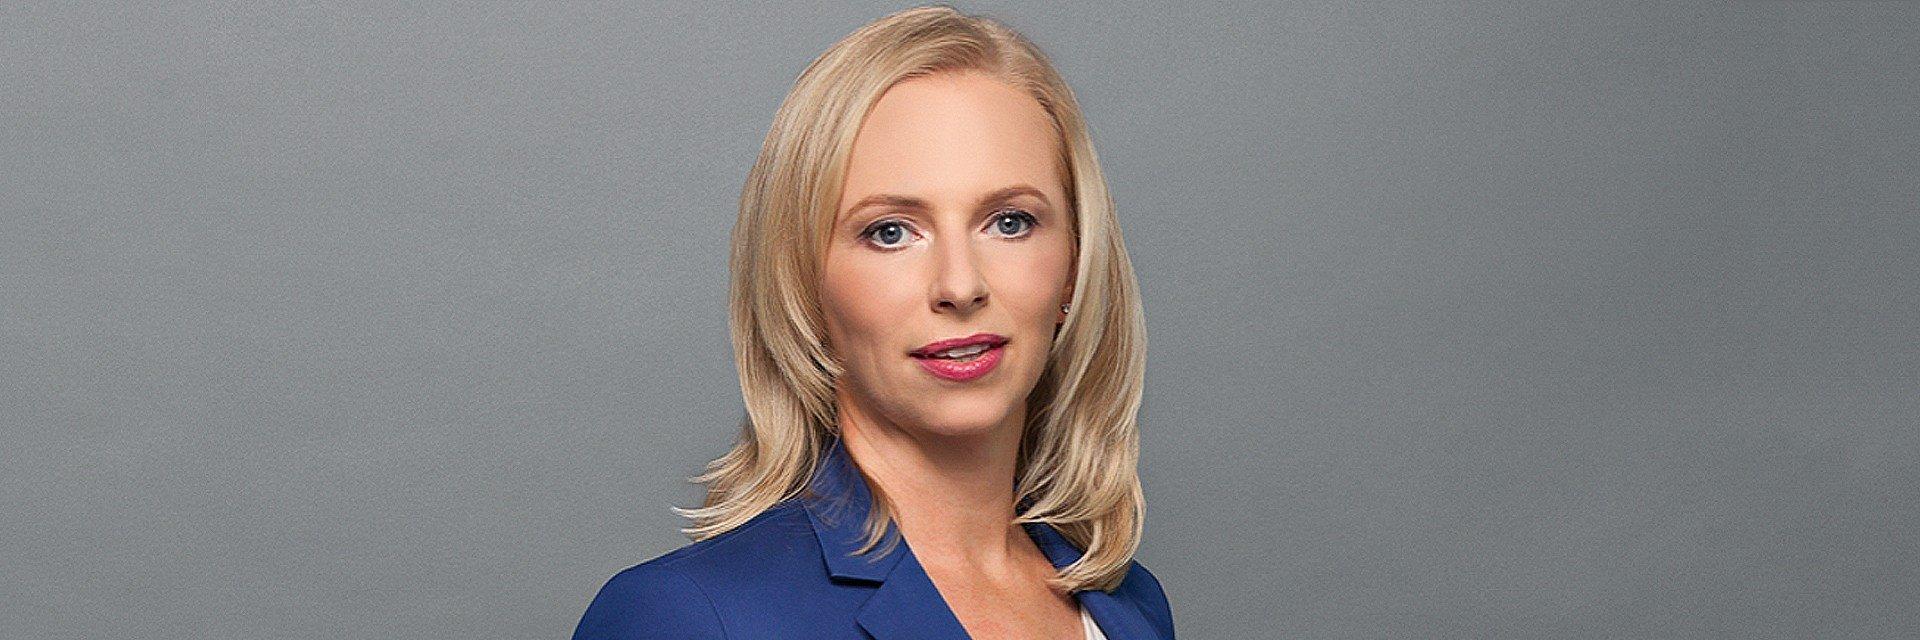 Łucja Gdala podsumowuje 2018 rok